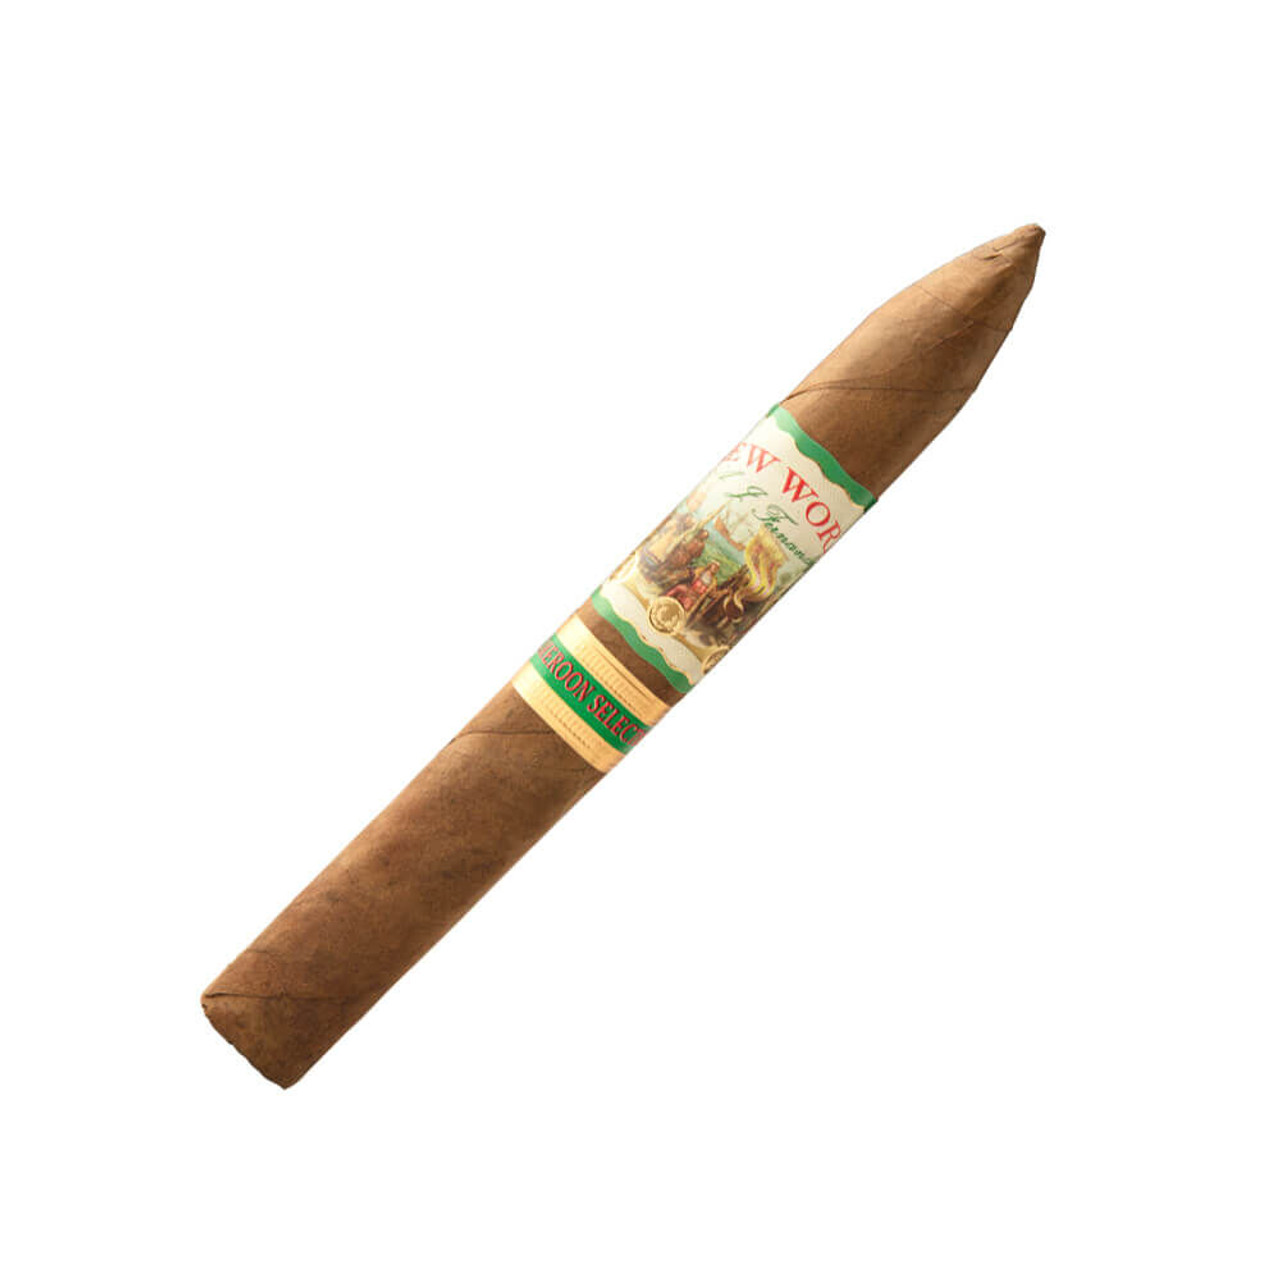 New World Cameroon by AJ Fernandez Torpedo Cigars - 6.5 x 52 (Box of 20)